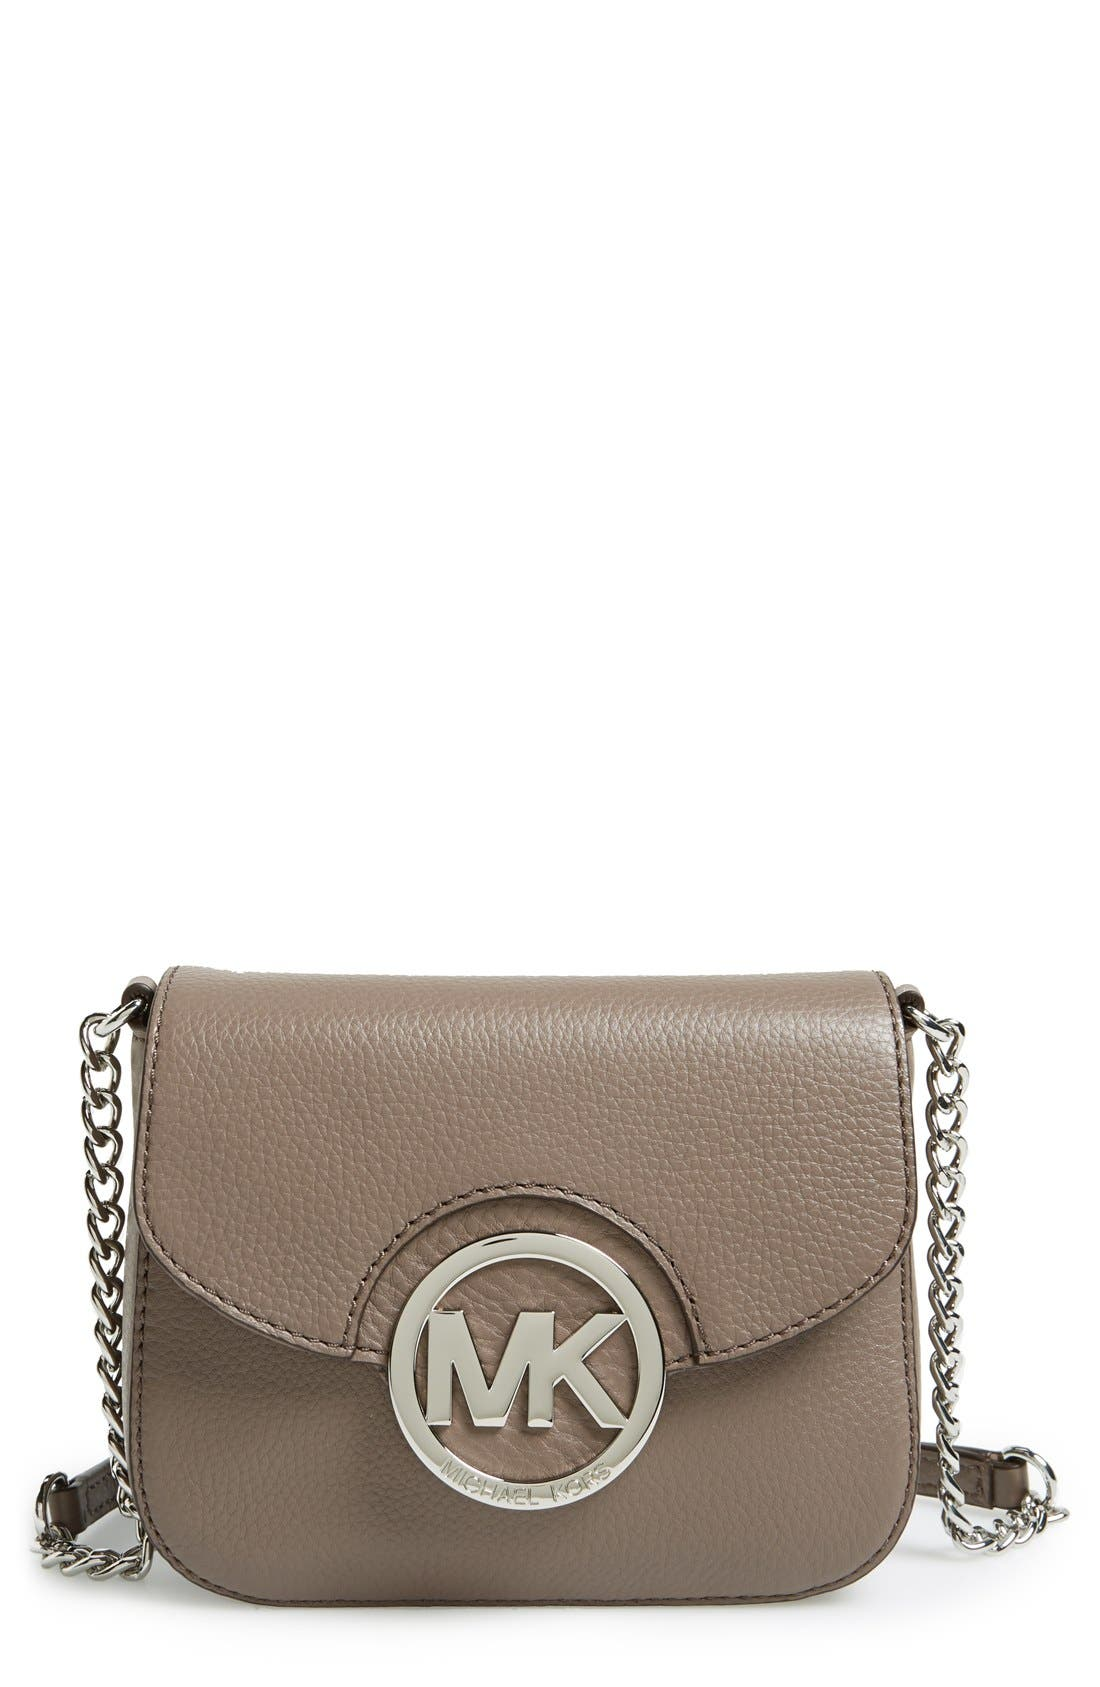 Main Image - MICHAEL Michael Kors 'Small Fulton' Crossbody Bag